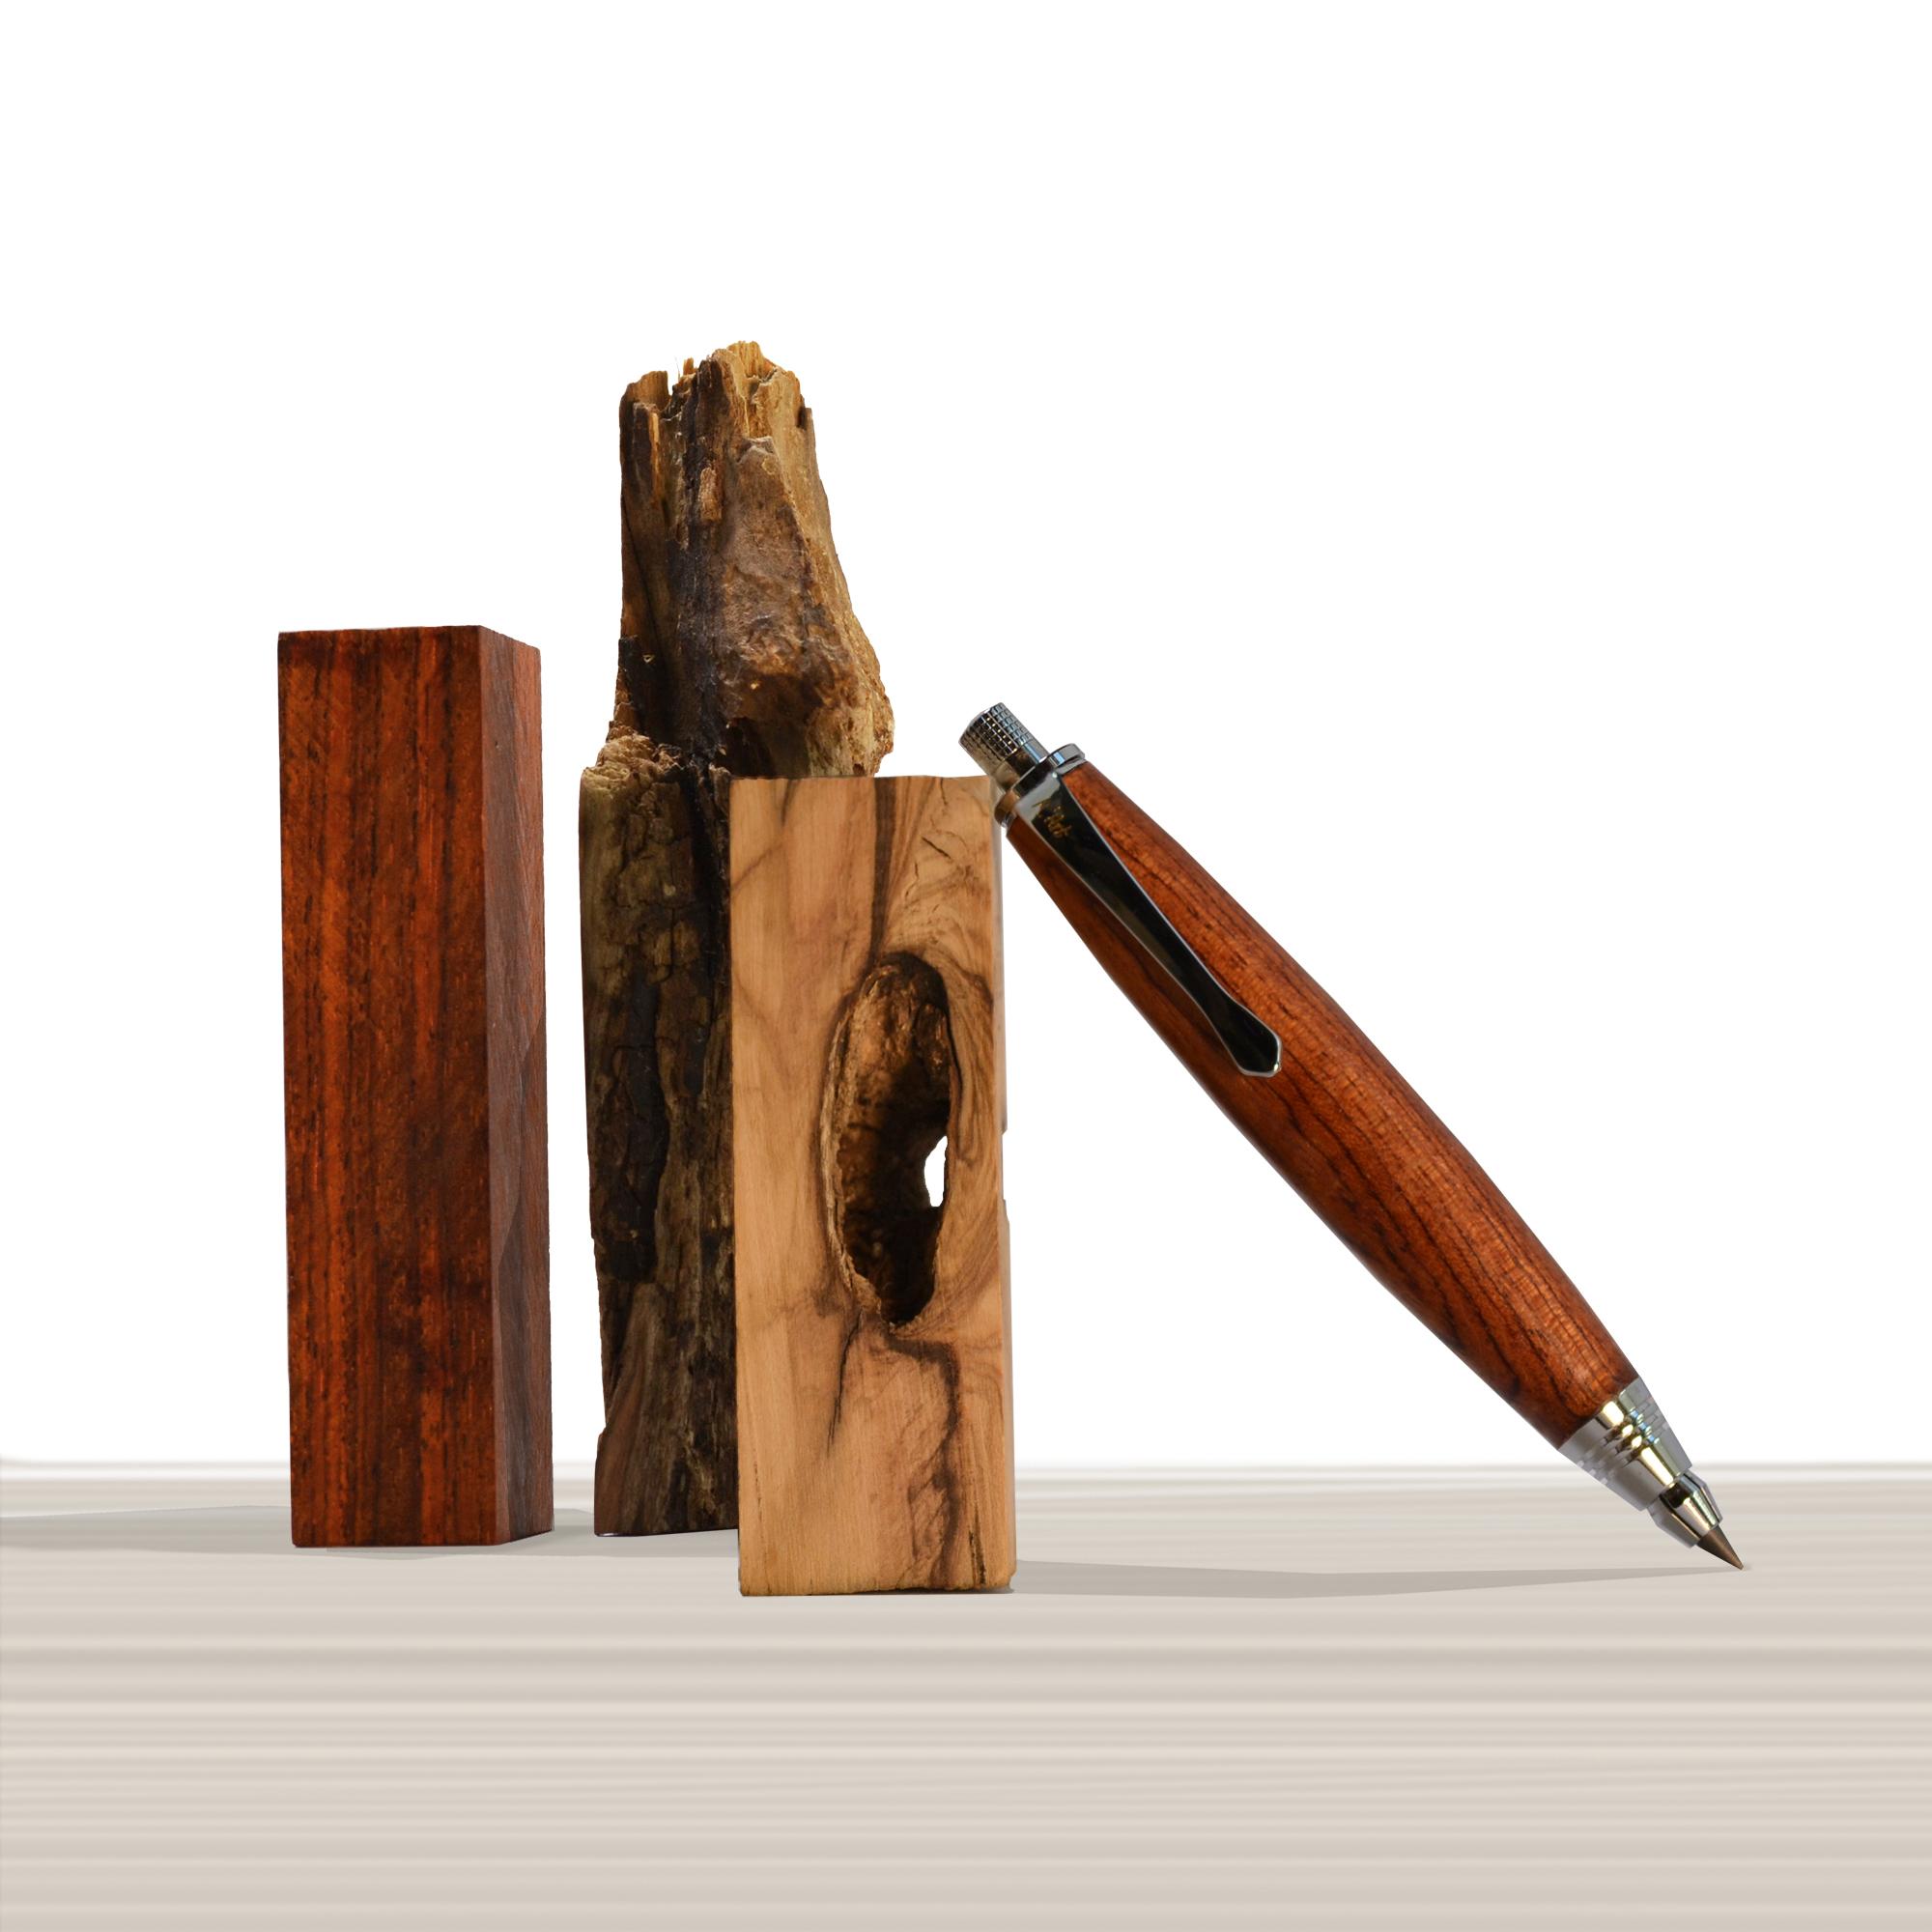 Ligabue pencil in Bubinga wood